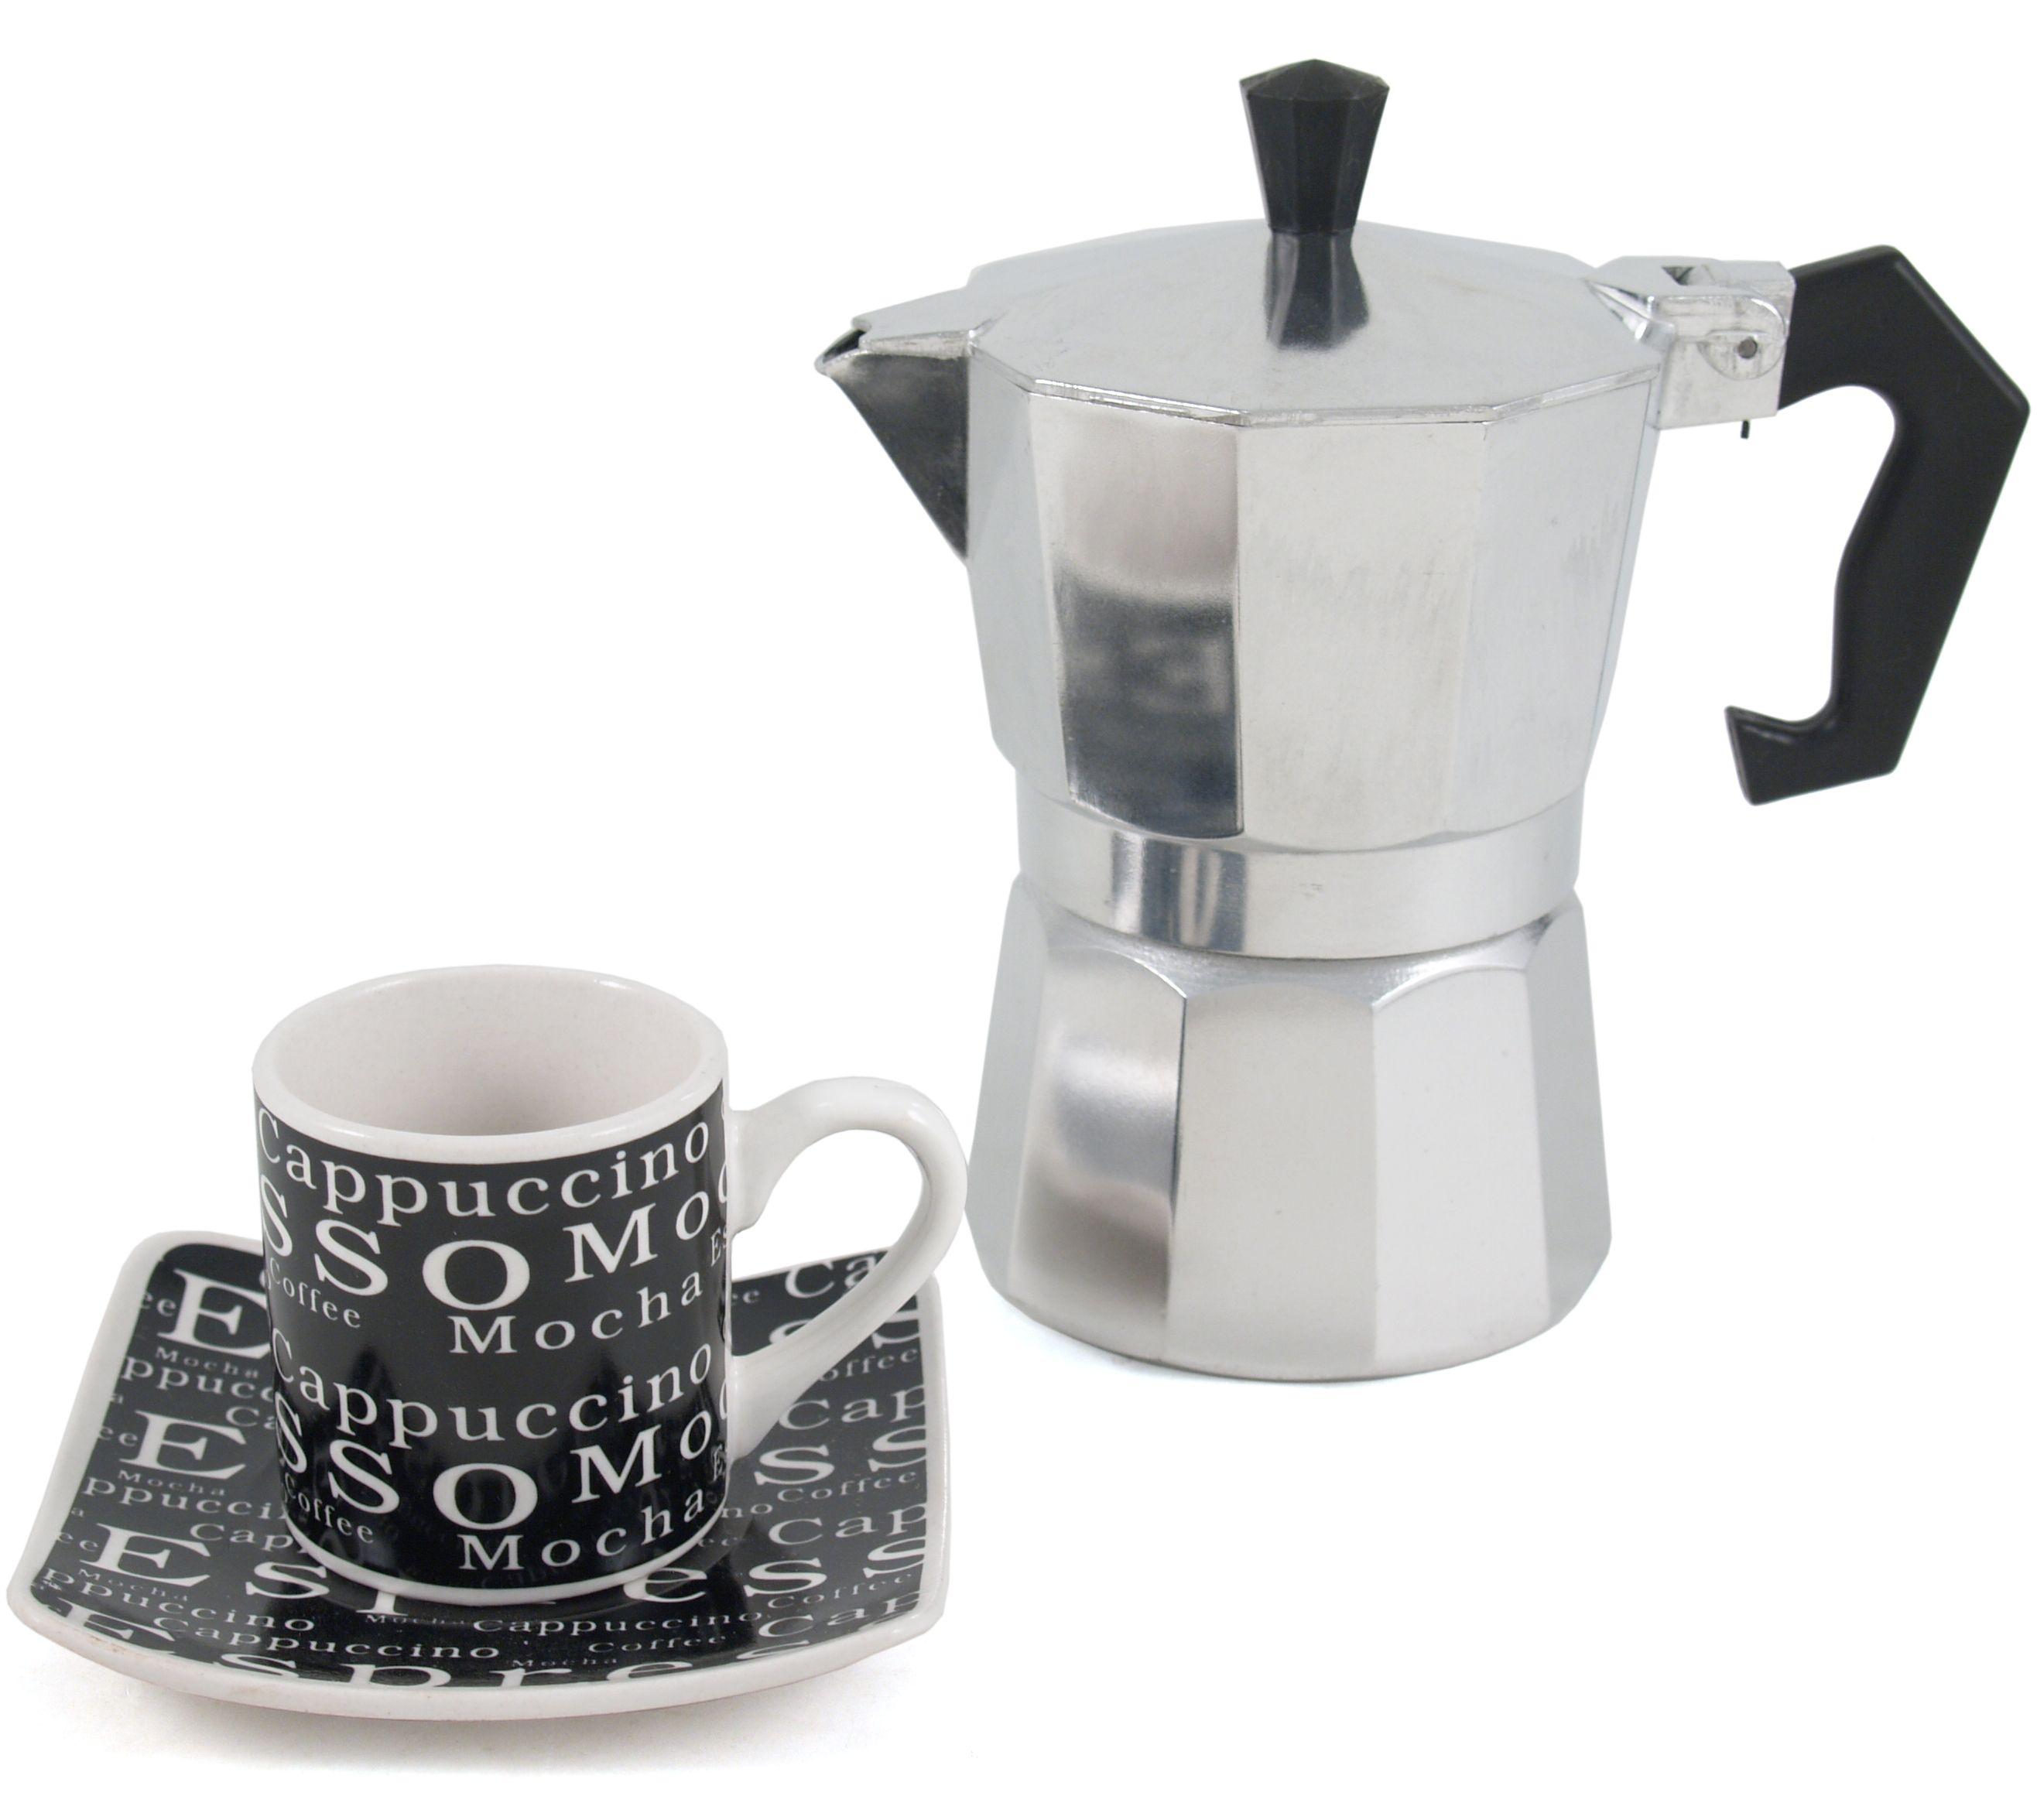 Primula Espresso Maker Set With Demitasse Cups 9 Piece Set Espresso Maker Demitasse Cups Coffee Works